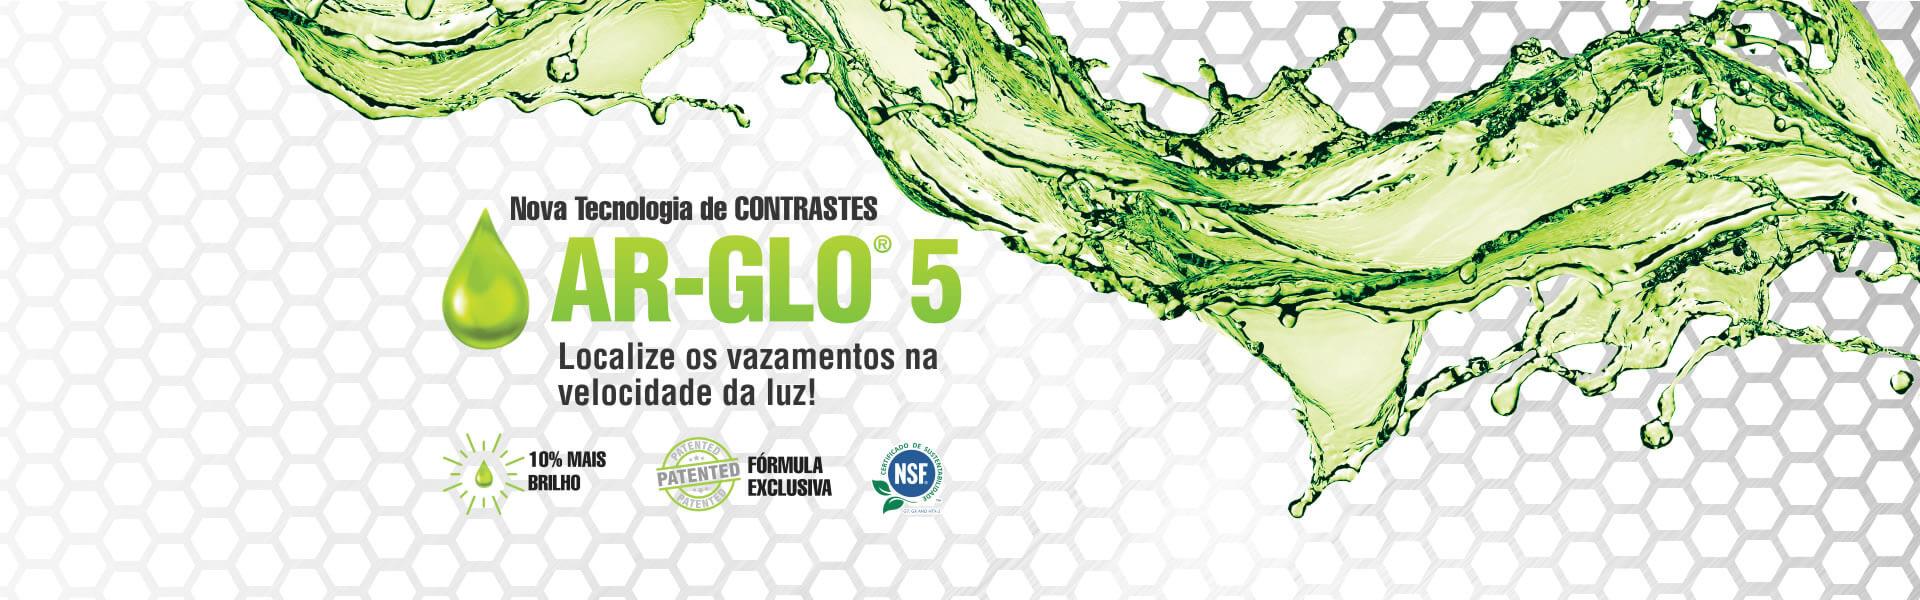 Contrastes Spectroline® novo AR-GLO®5